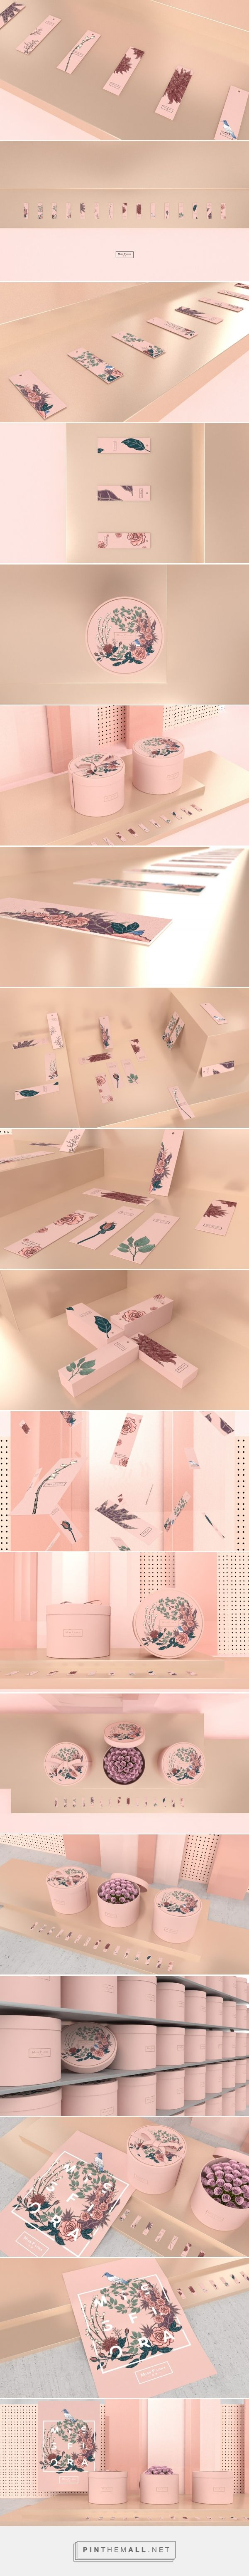 Miss Flora Florist Packaging by Hellocean | Fivestar Branding Agency – Design and Branding Agency & Curated Inspiration Gallery  #floristbranding #florist #branding #brand #packaging #design #designinspiration